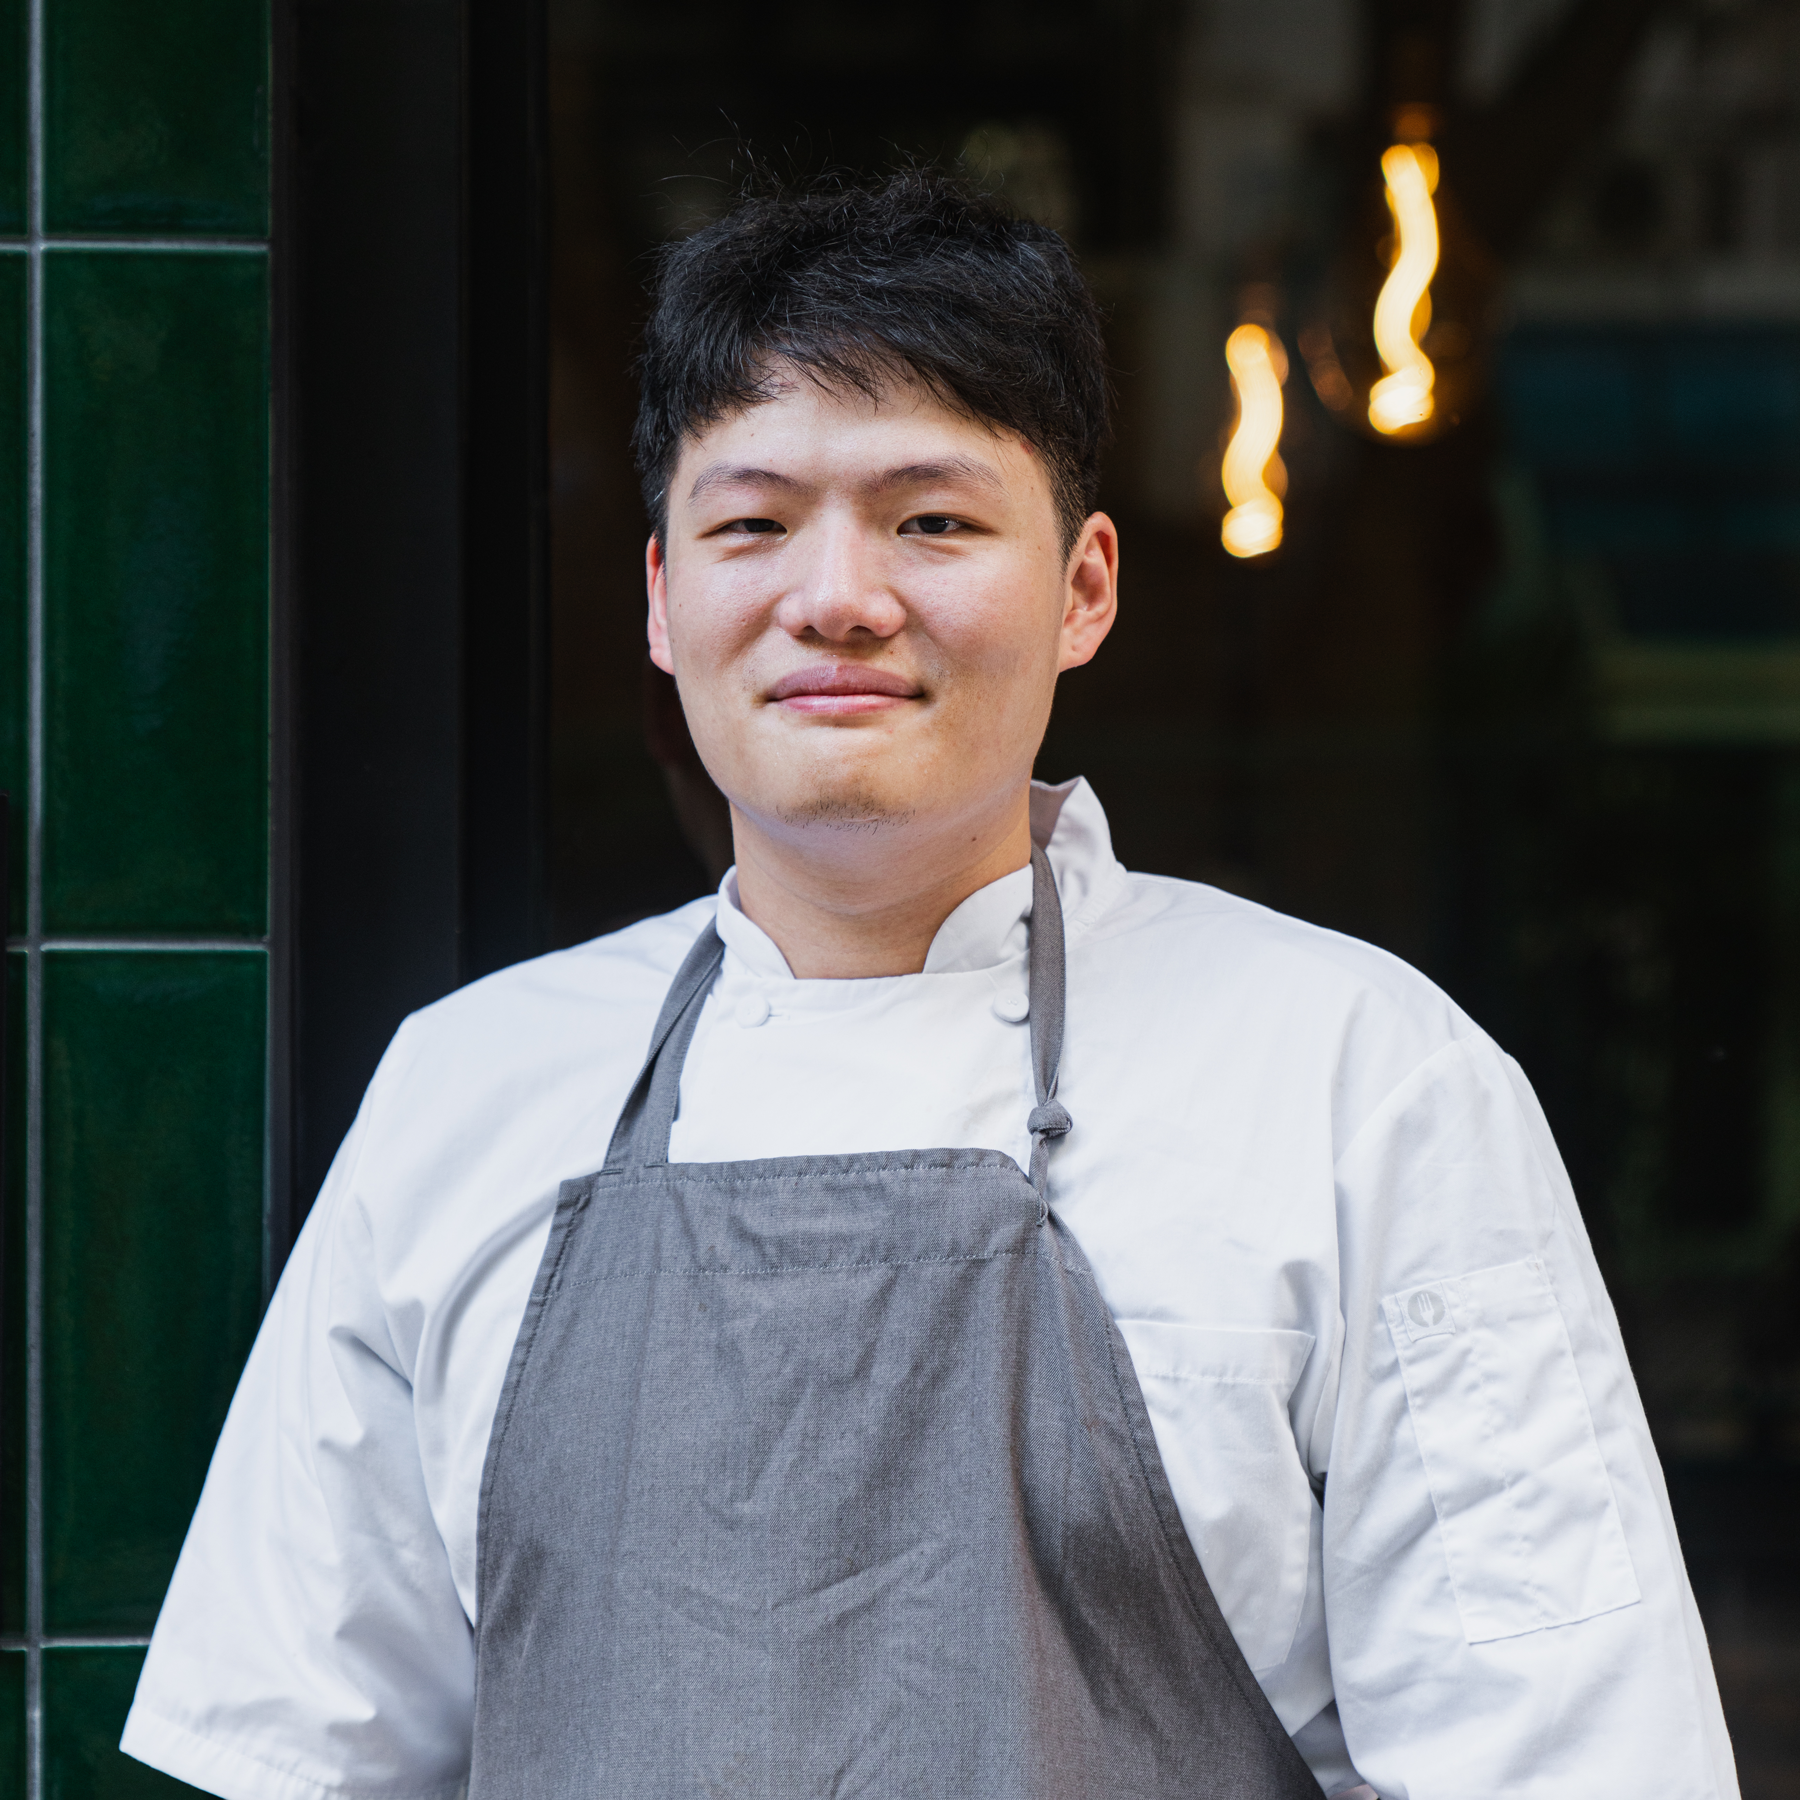 chef-barry-portrait.png